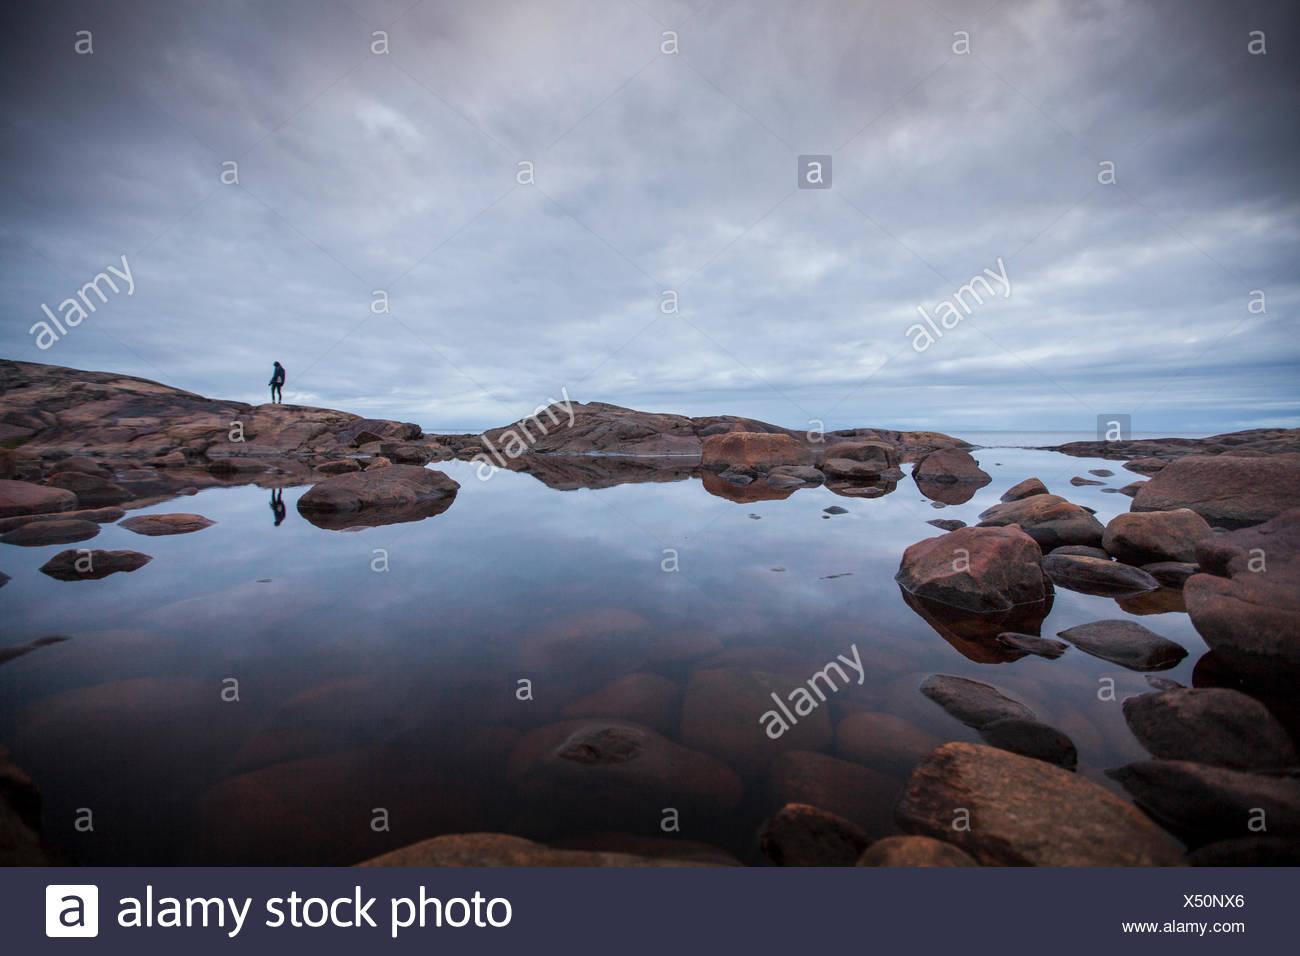 Donna in piedi da un rock pool in Vasterbotten, Svezia Immagini Stock